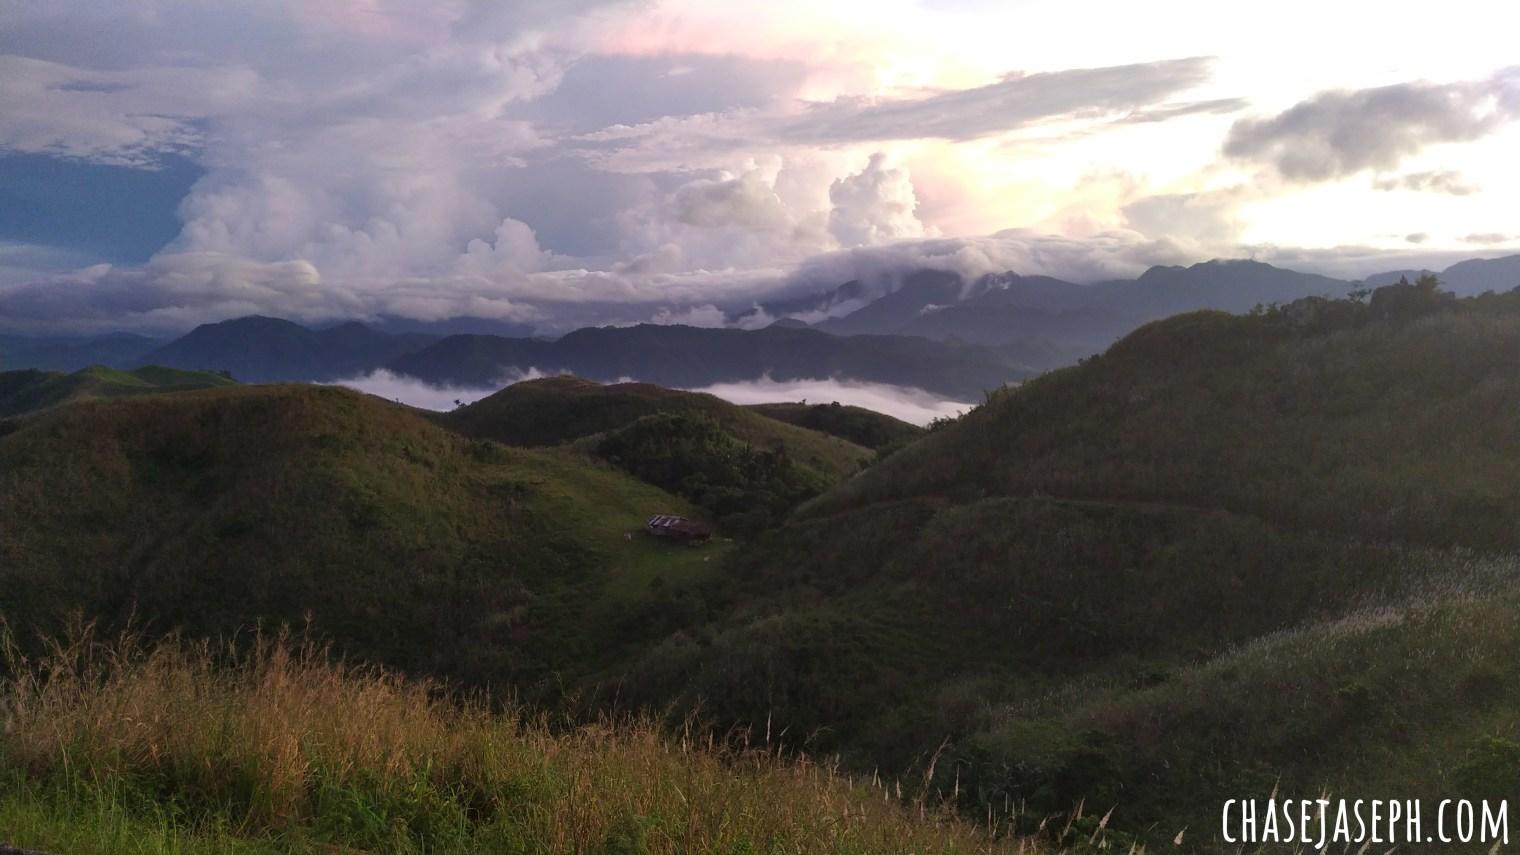 Mt. Kulis - Tanay, Rizal (Climb Guide)